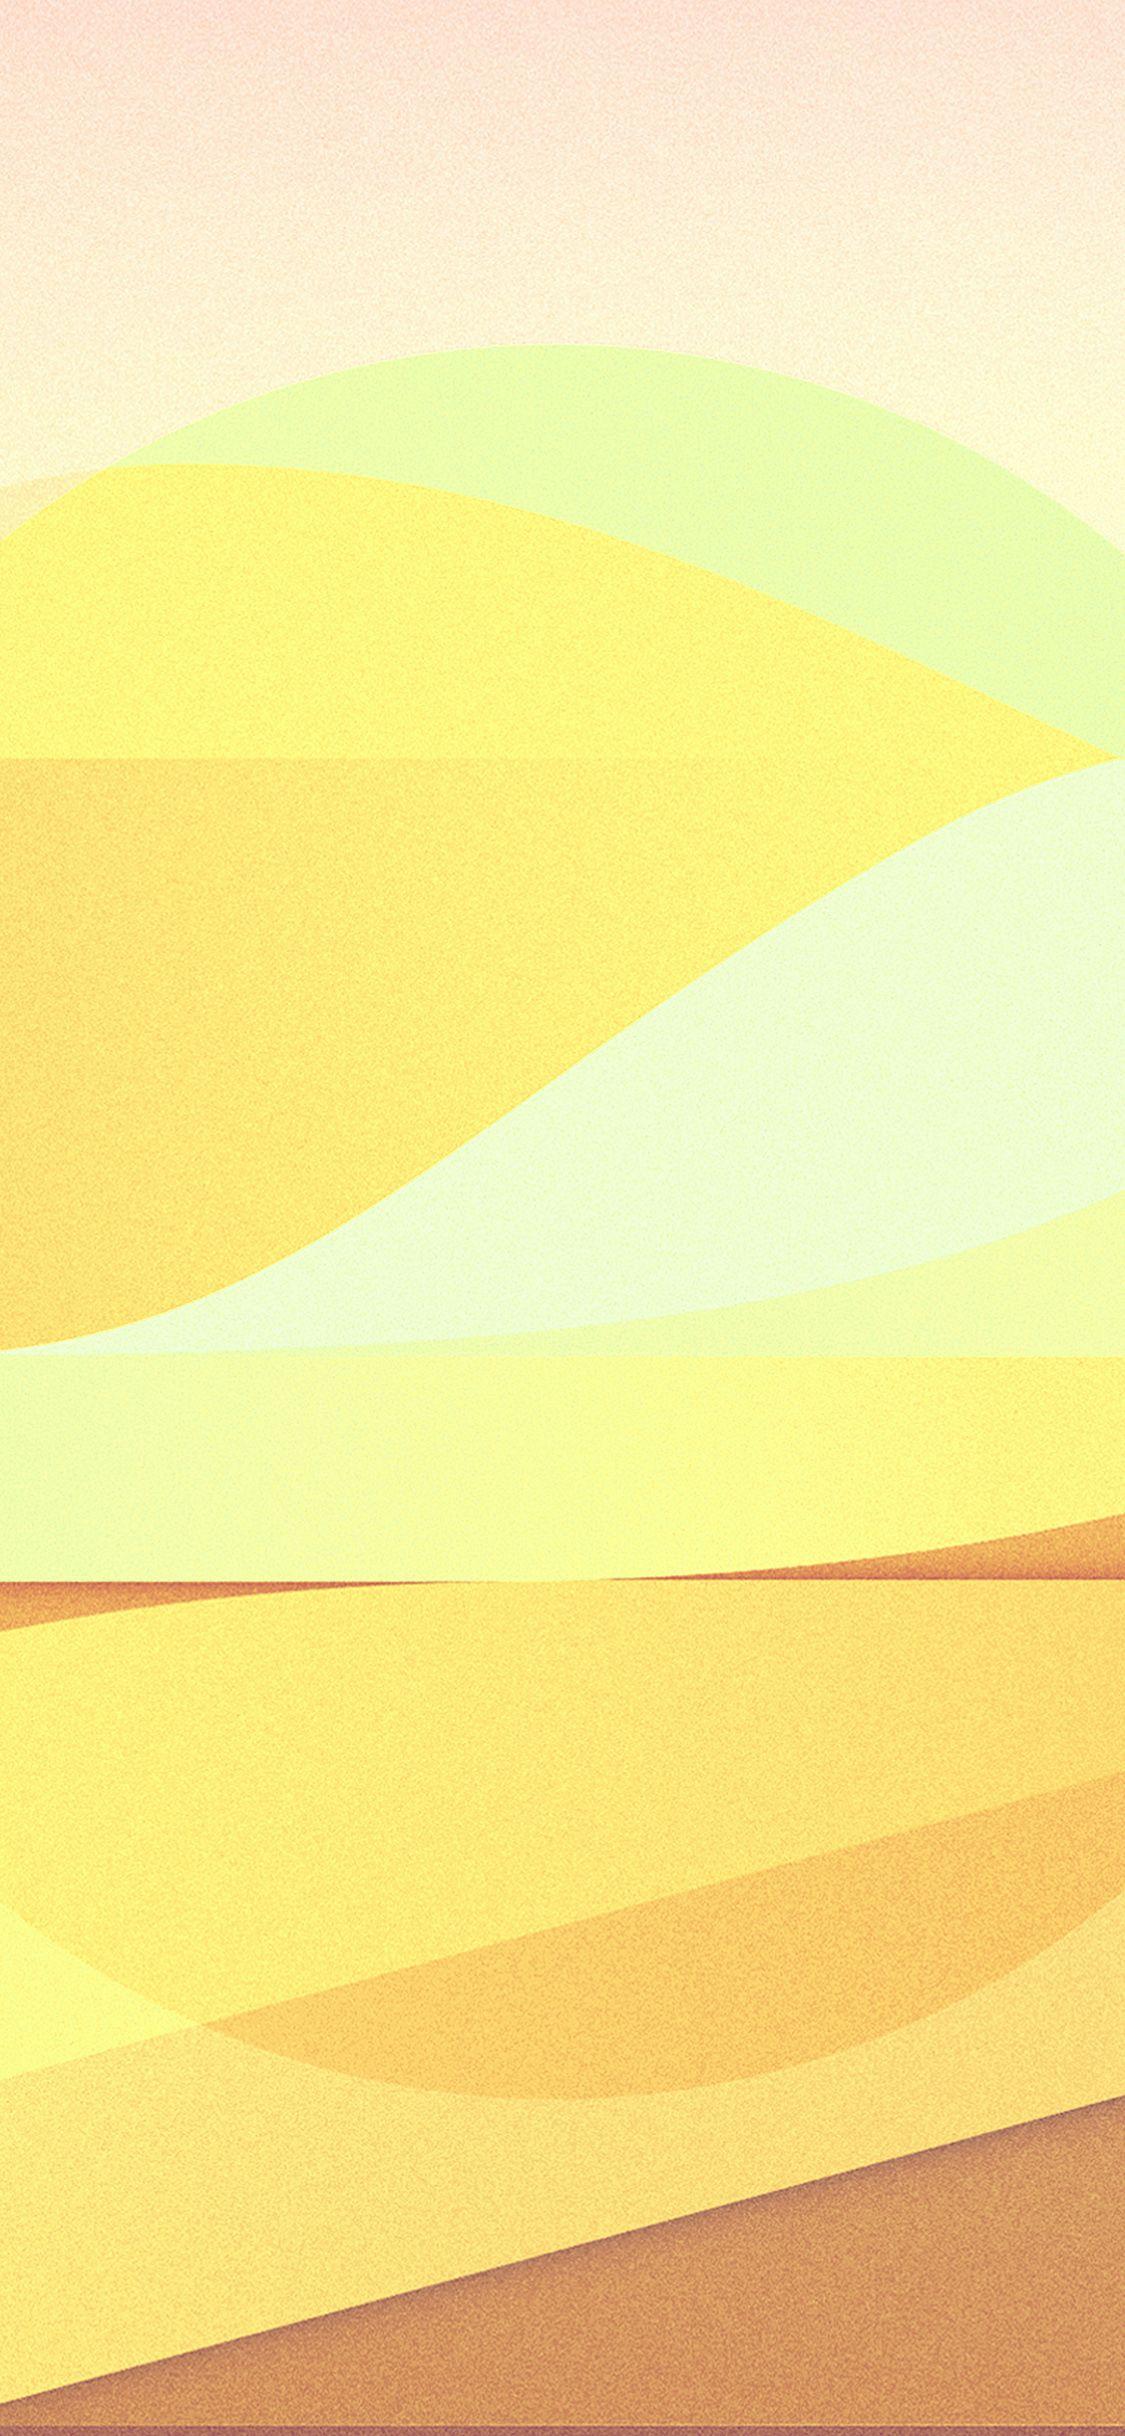 Iphonex Wallpaper Vx55 Sun Rise Pattern Background Yellow